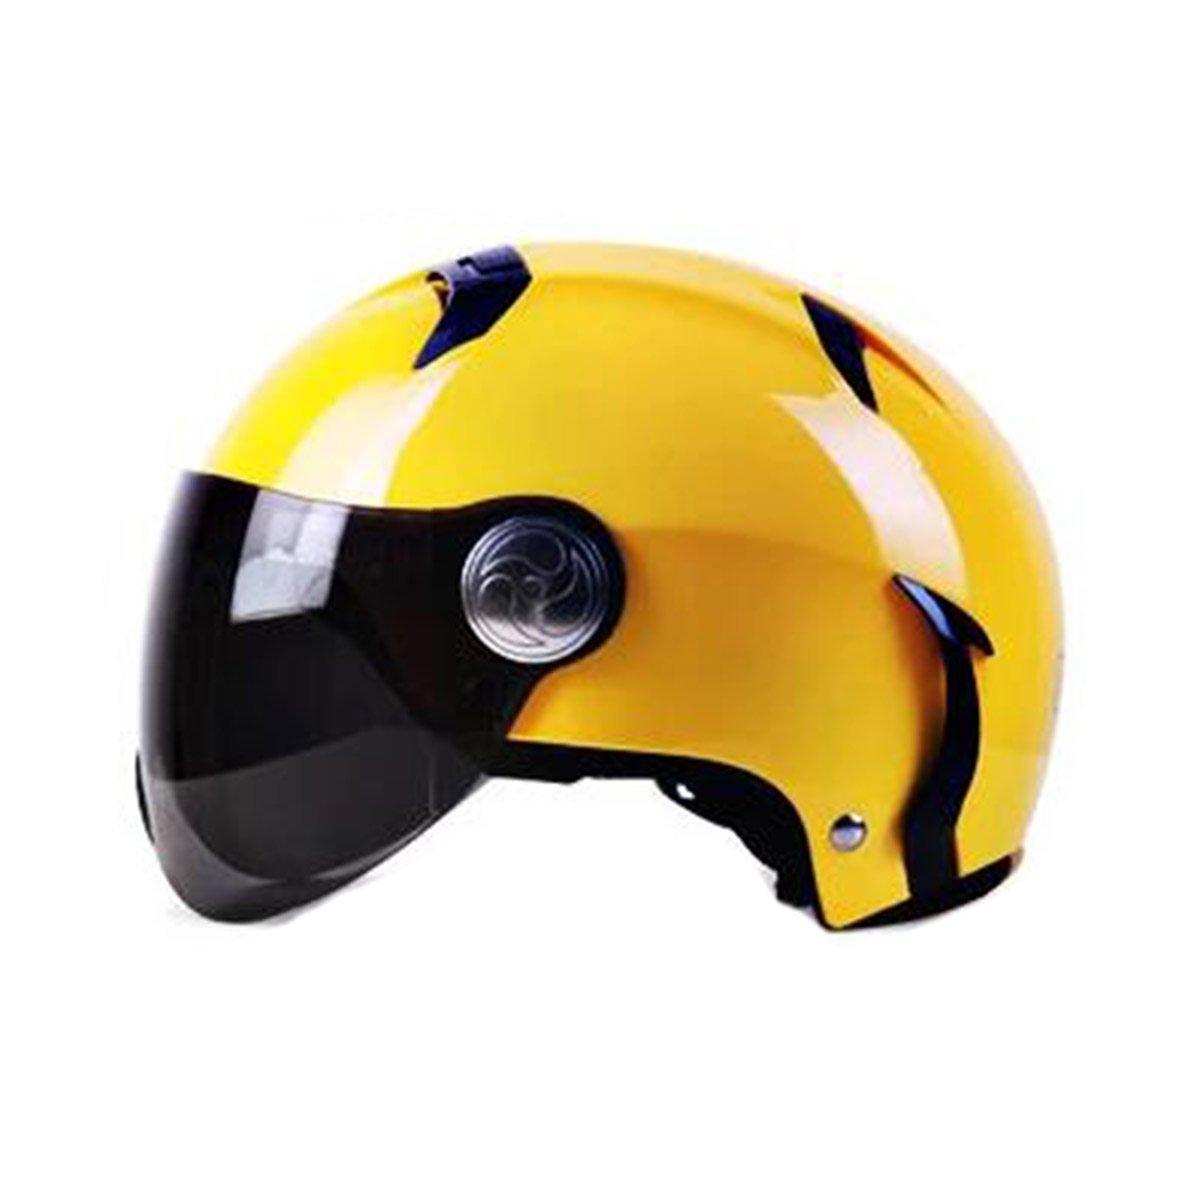 TZQ Erwachsener Safe Road Mann Dame Outdoors Mountain Bike Motorrad Halber Helm City Scooter Helm